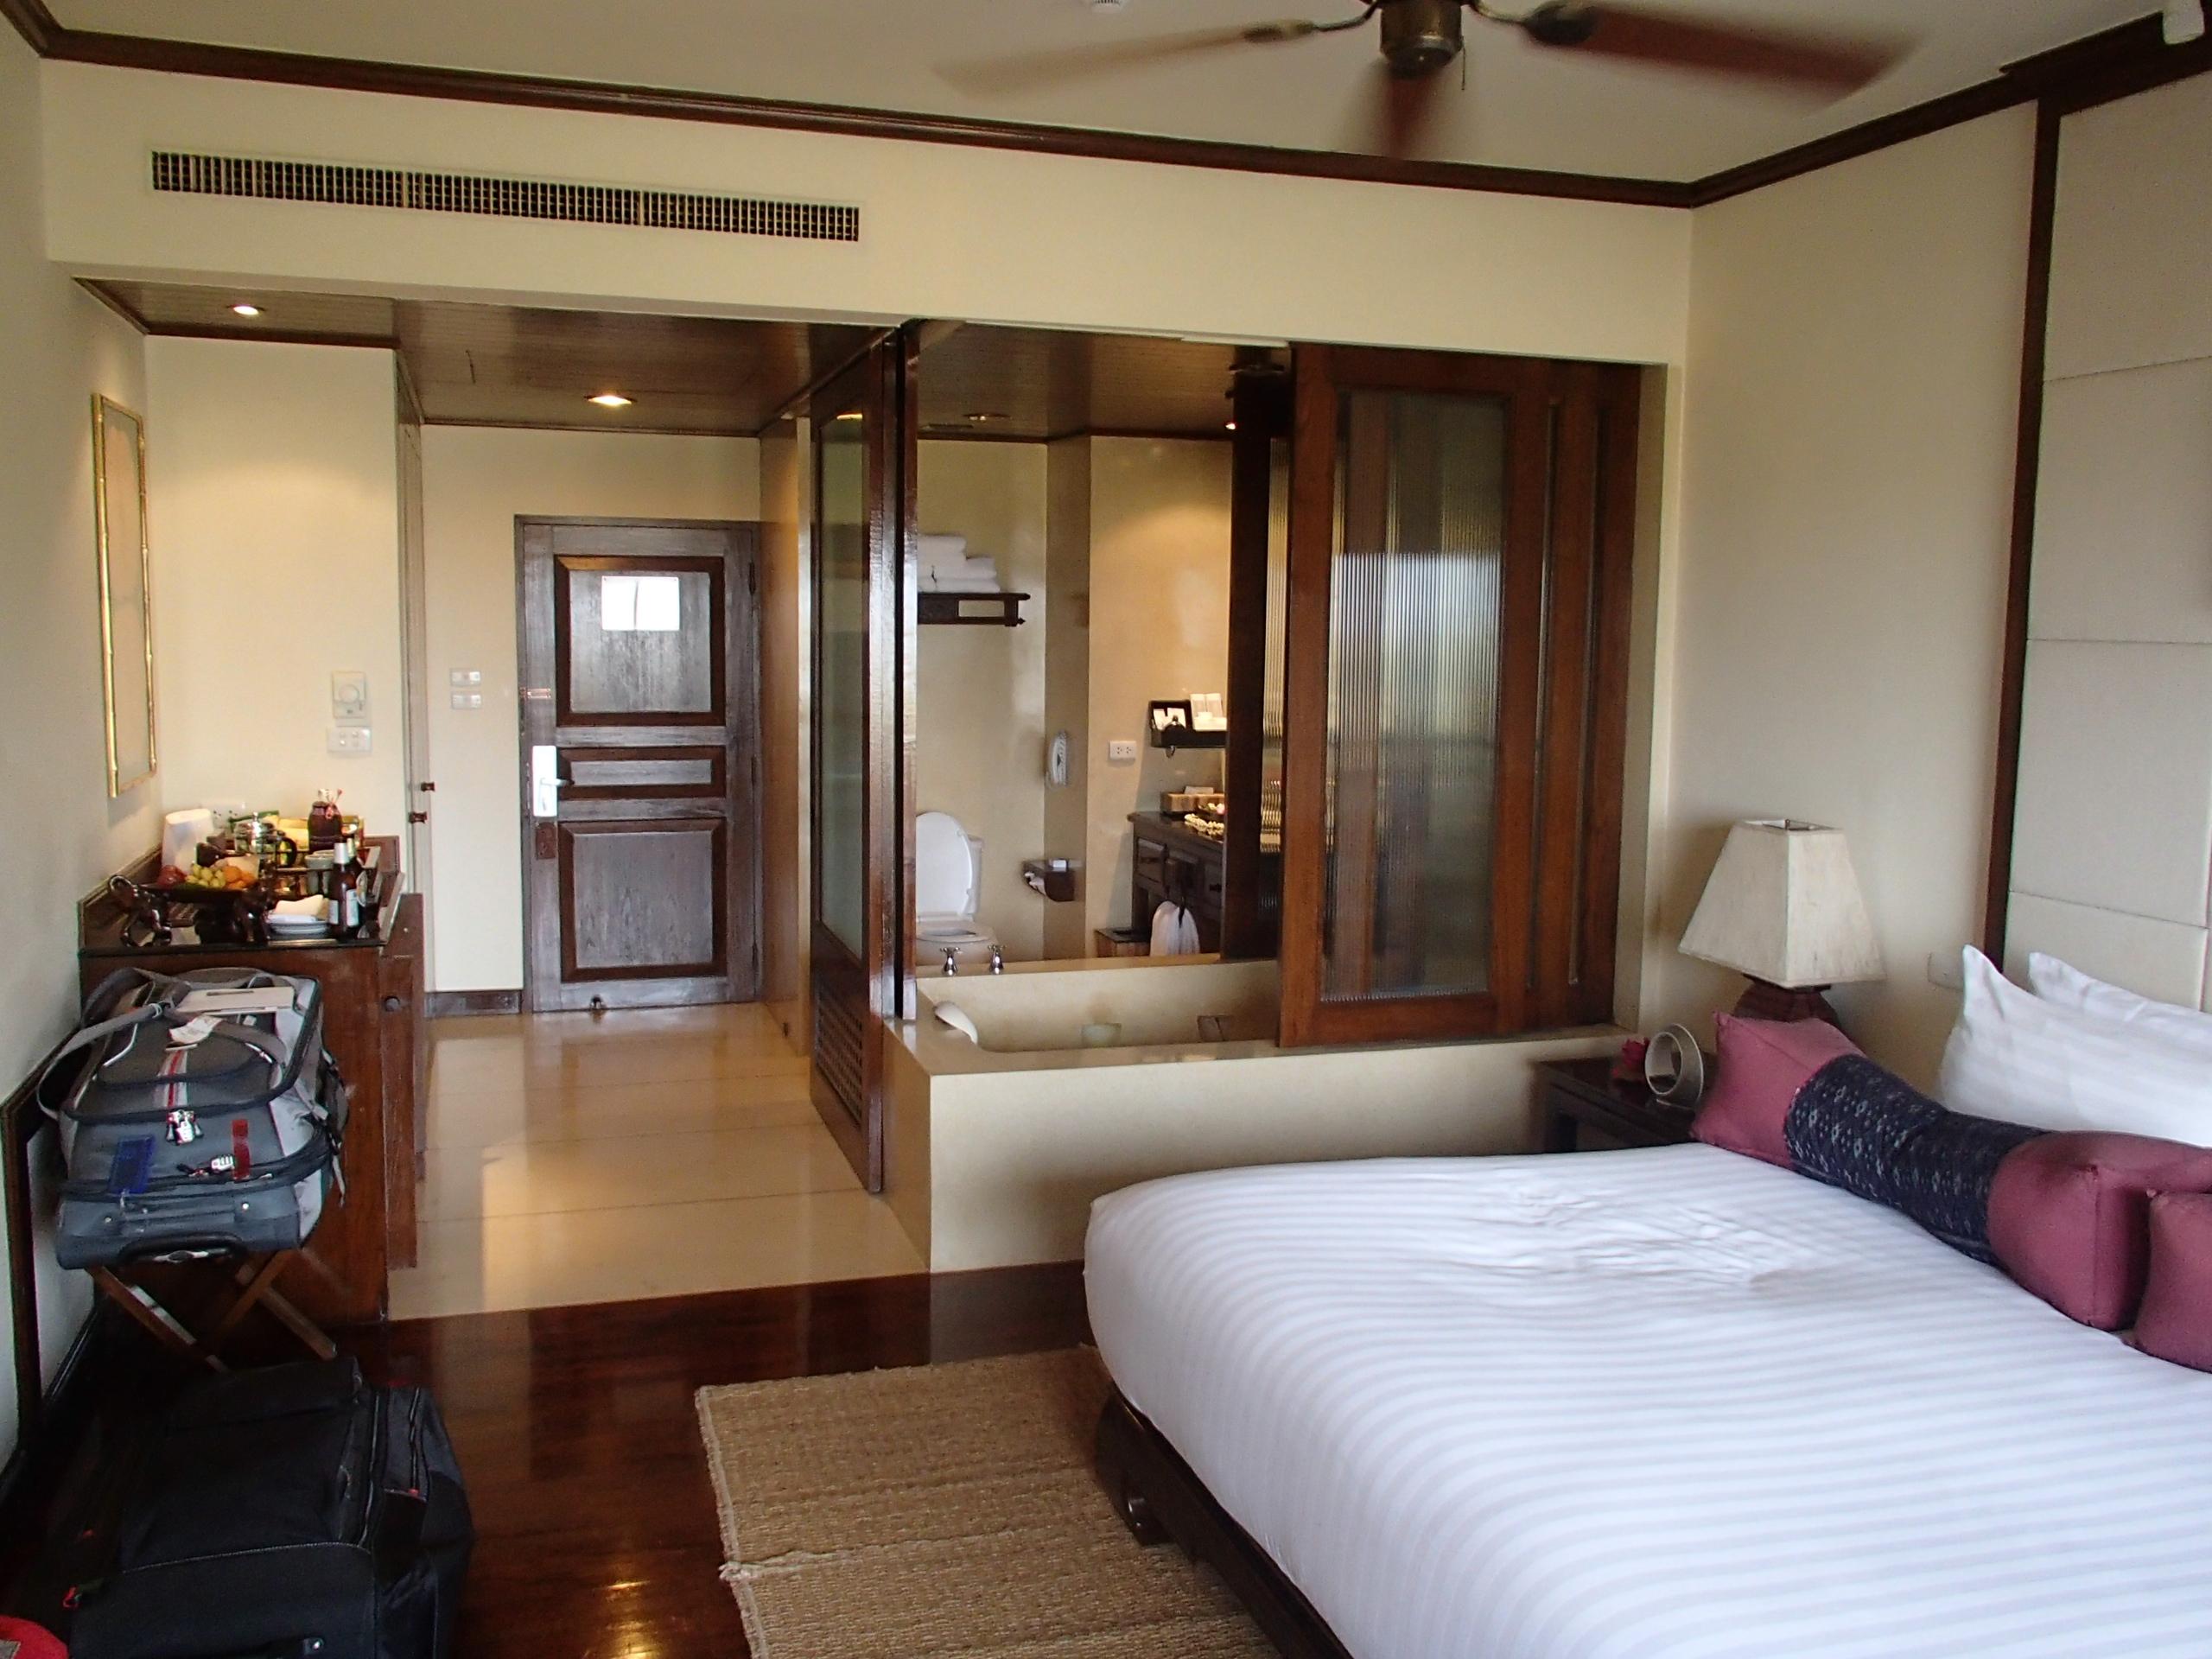 Anantara room